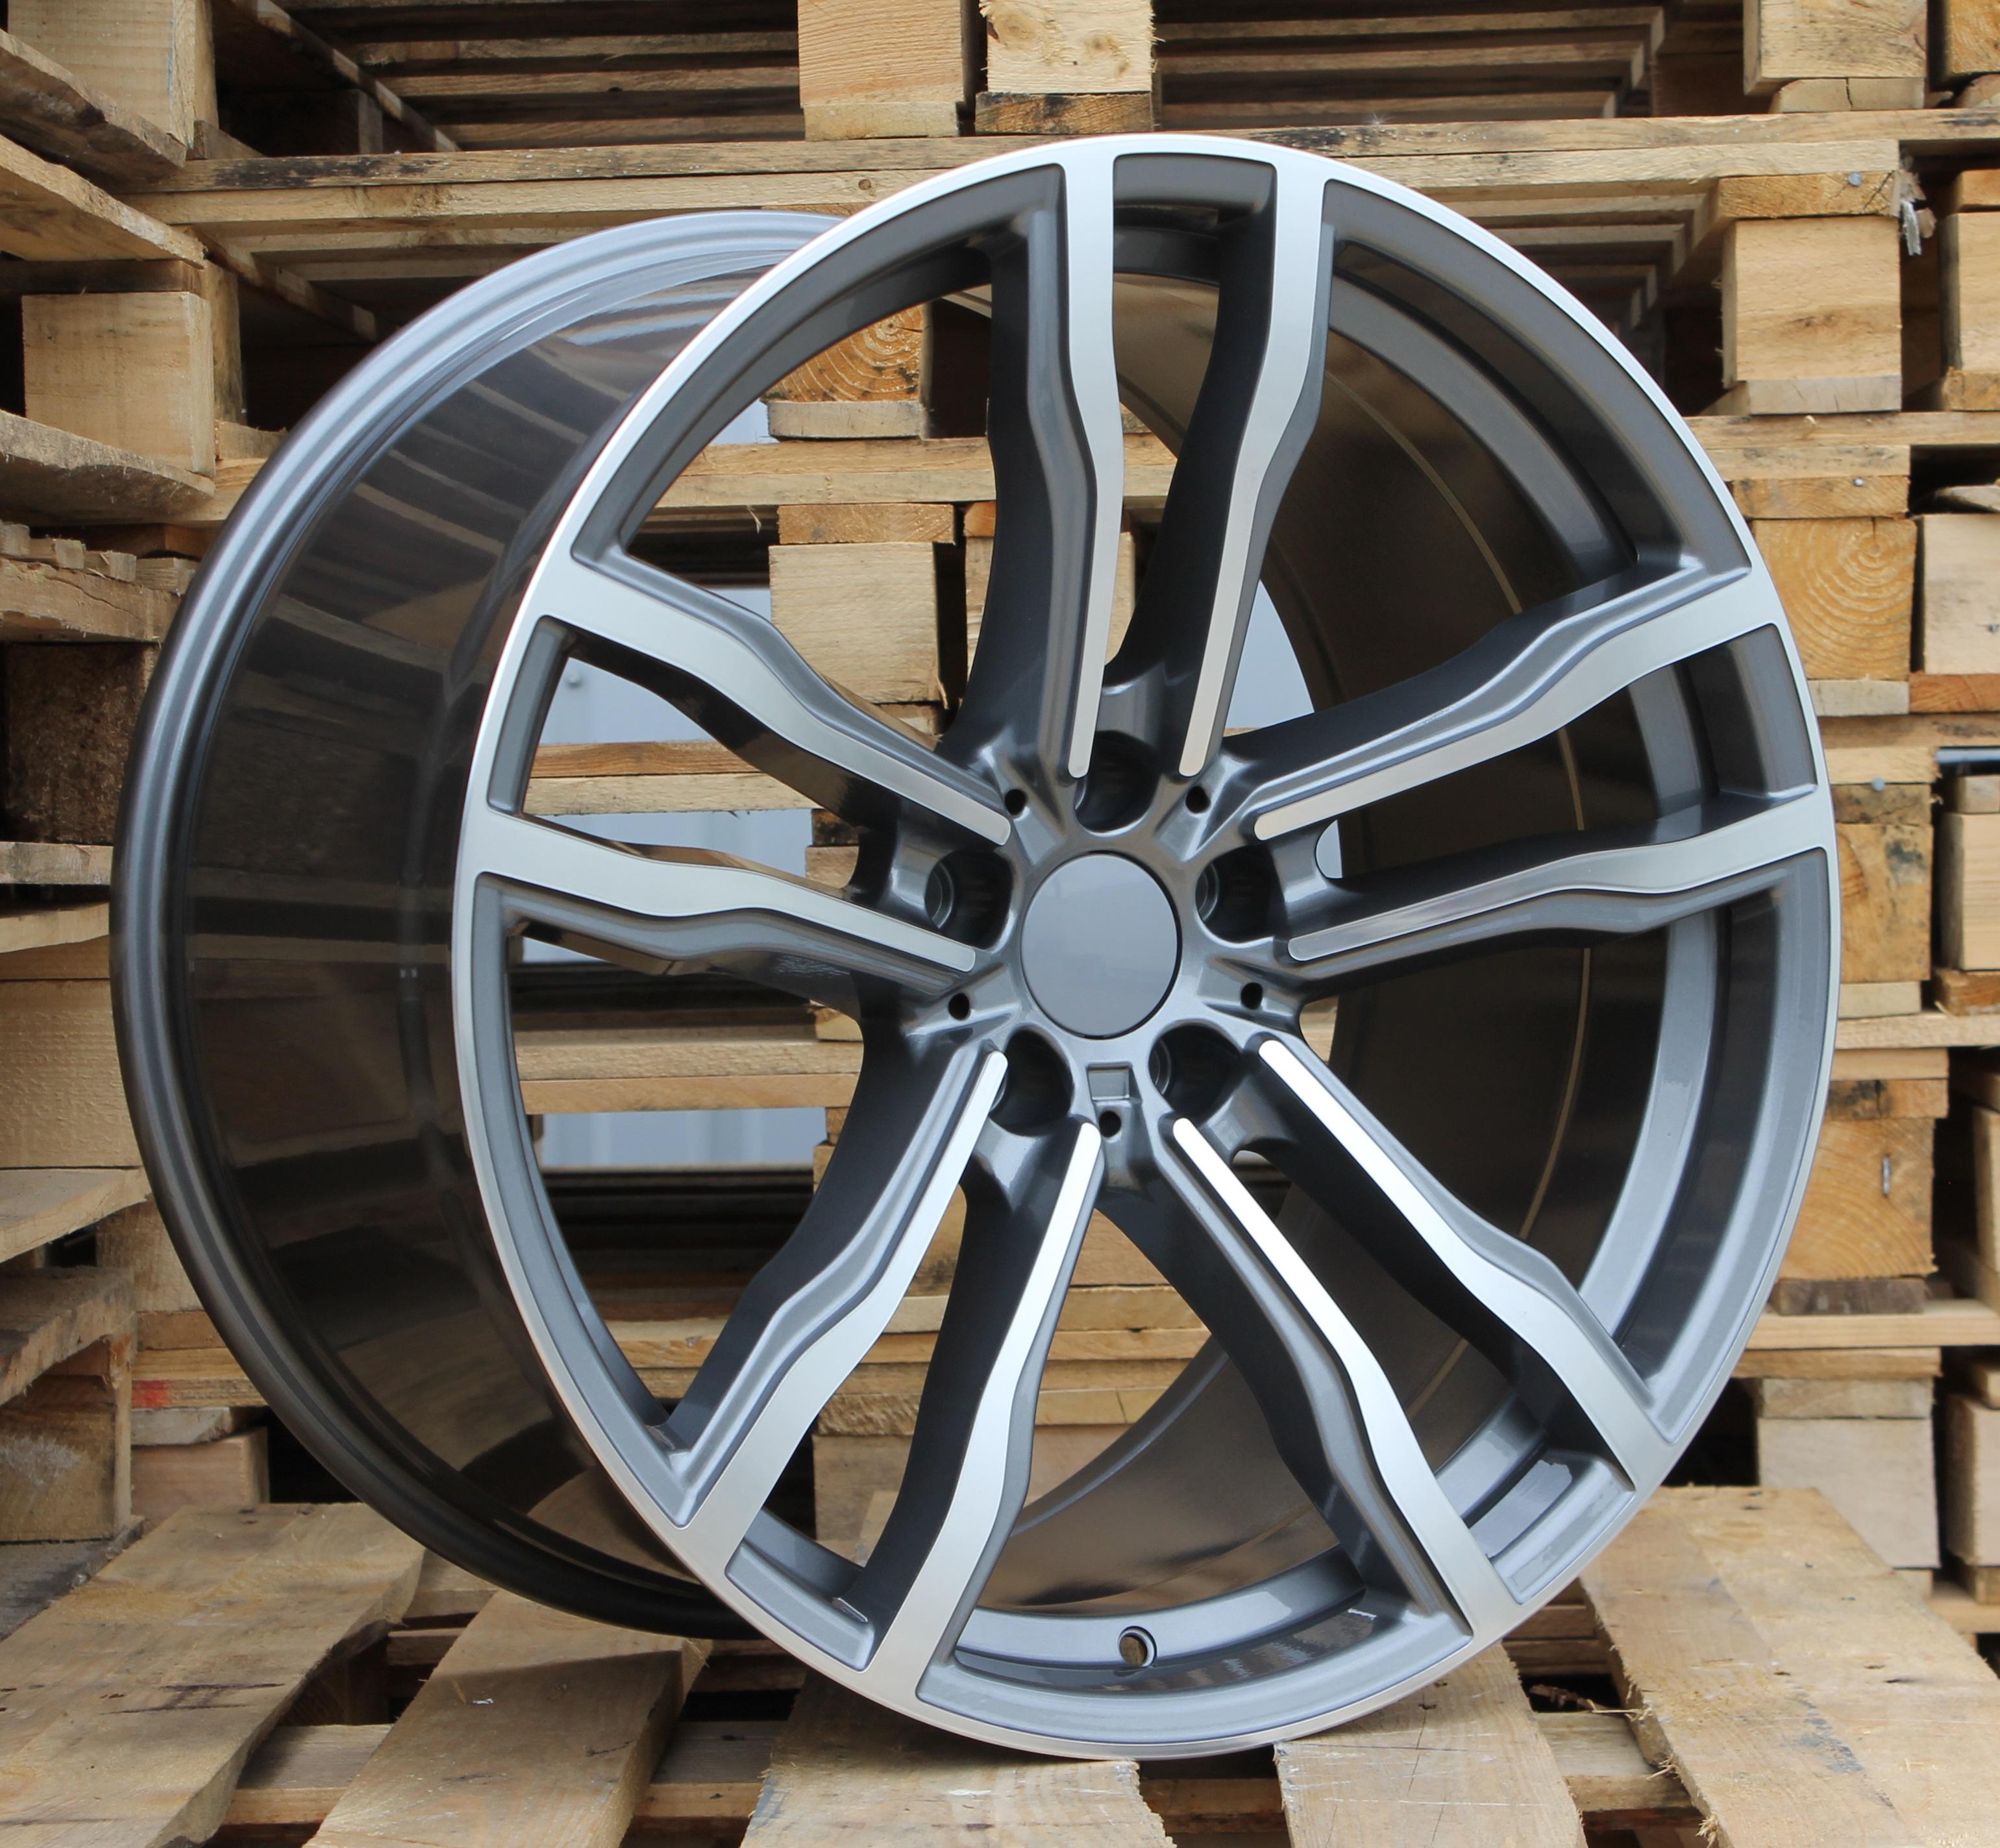 B20X10 5X120 ET40 74.1 BY588 (DLJ588) MG (Rear+Front) RWR BM (K5+P) 10x20 ET40 5x120